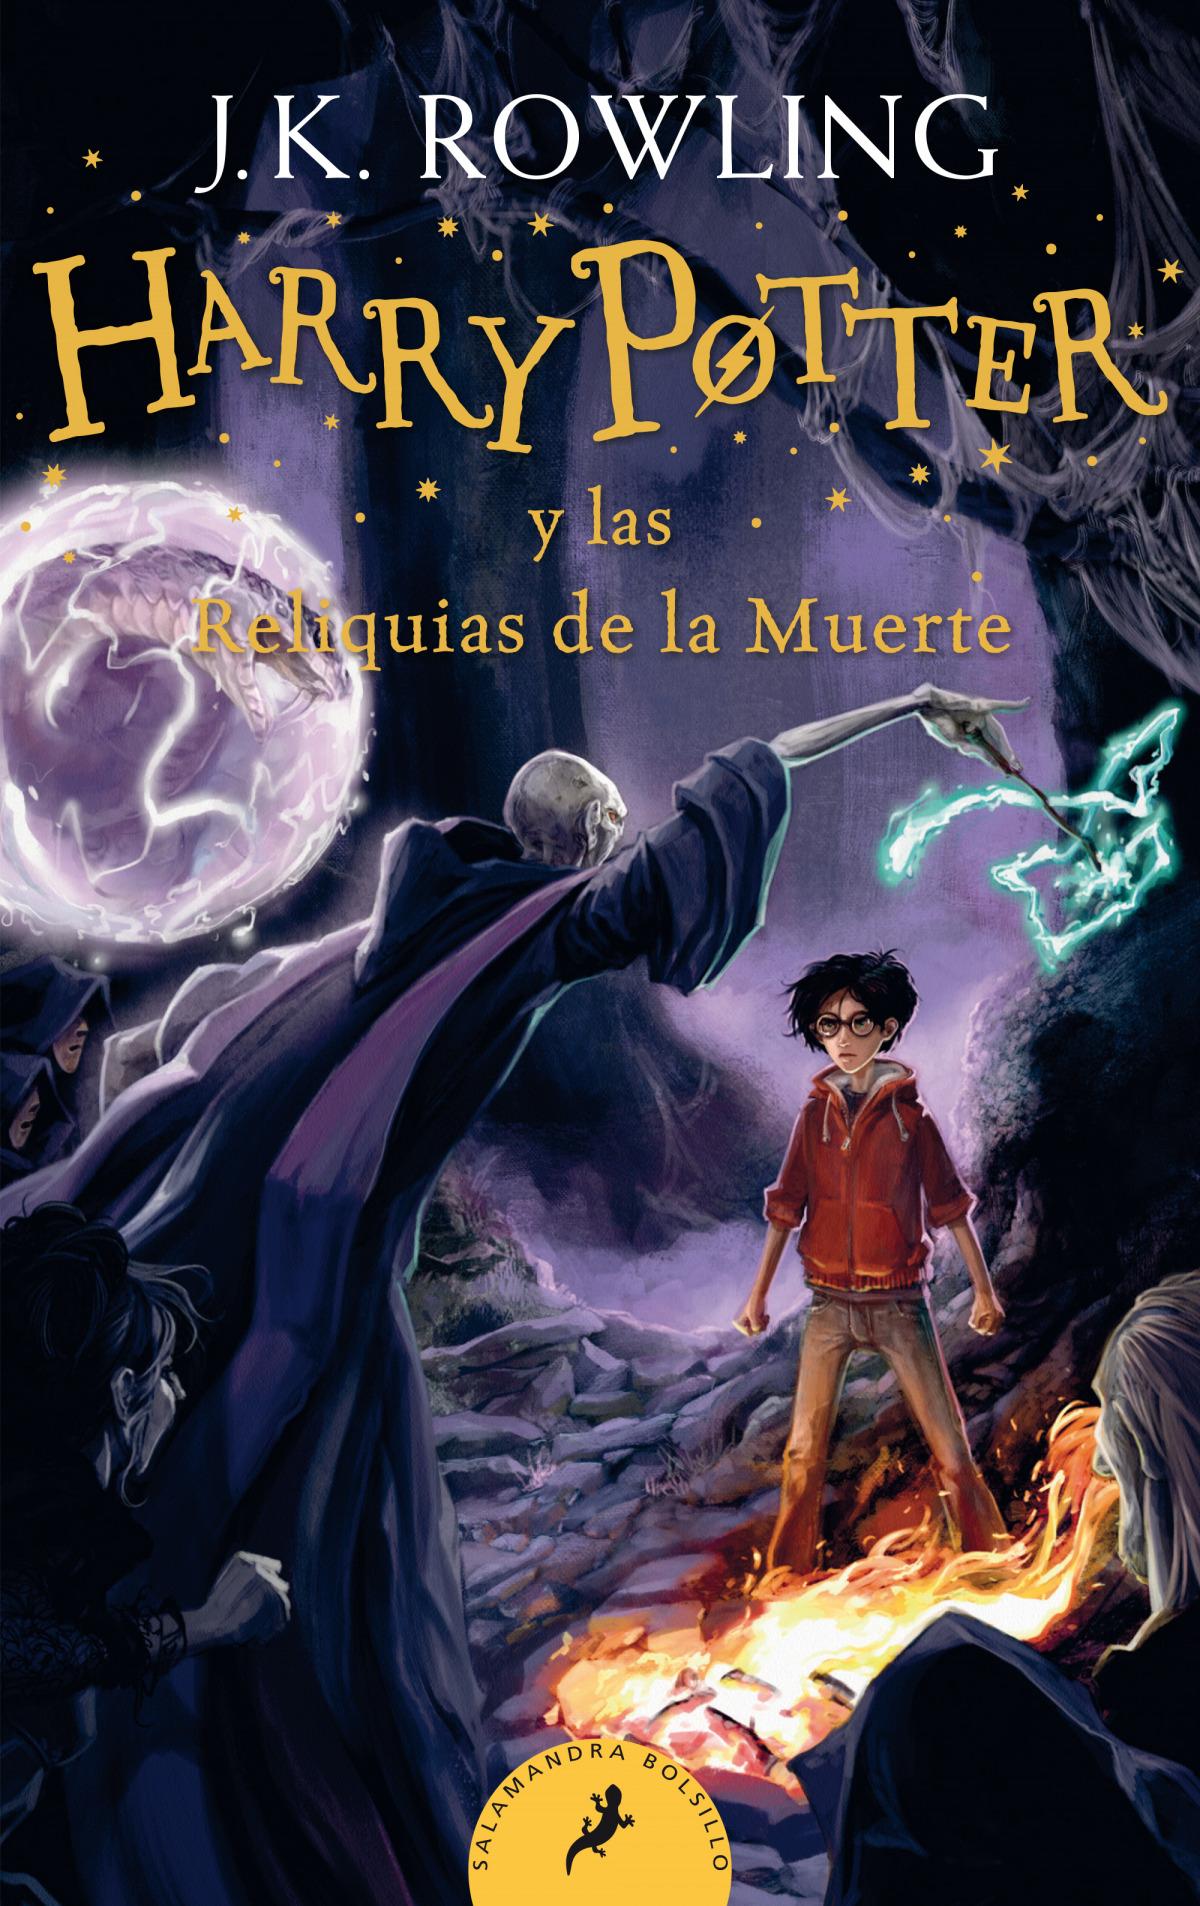 Harry Potter y las reliquias de la muerte (Harry Potter 7) 9788418173134